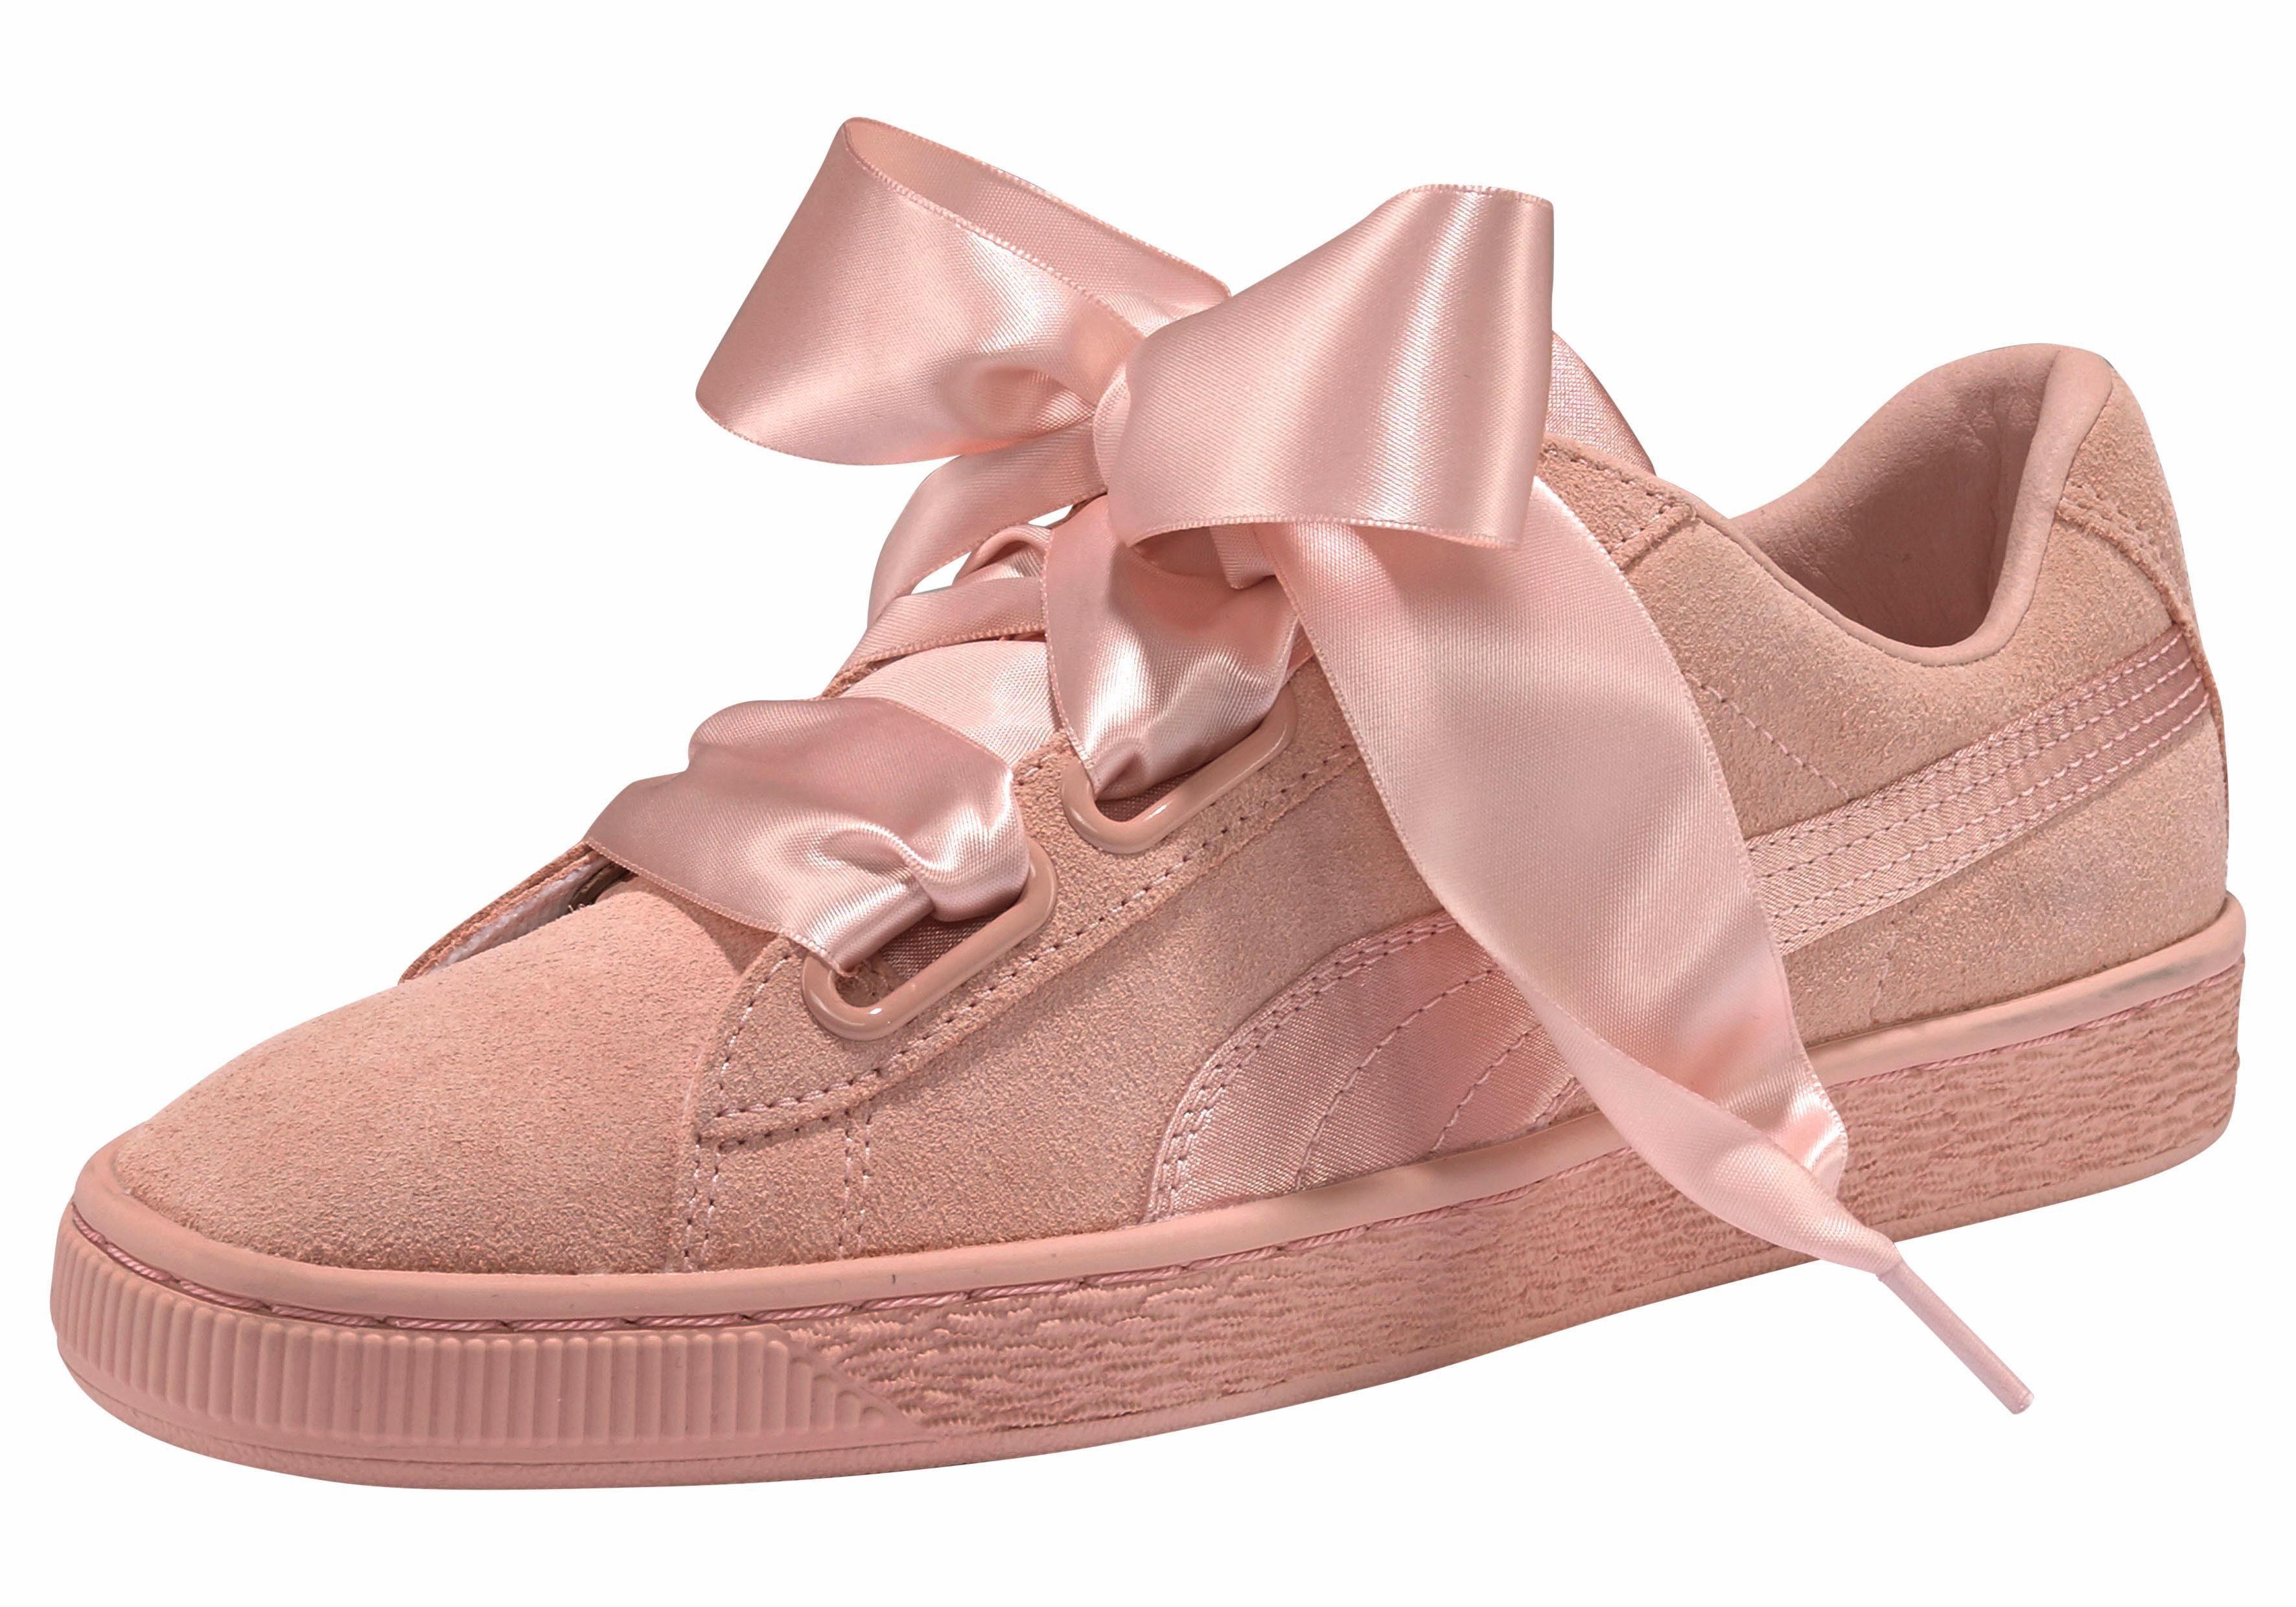 puma schuhe damen rosa mit schleife freizeitschuhe